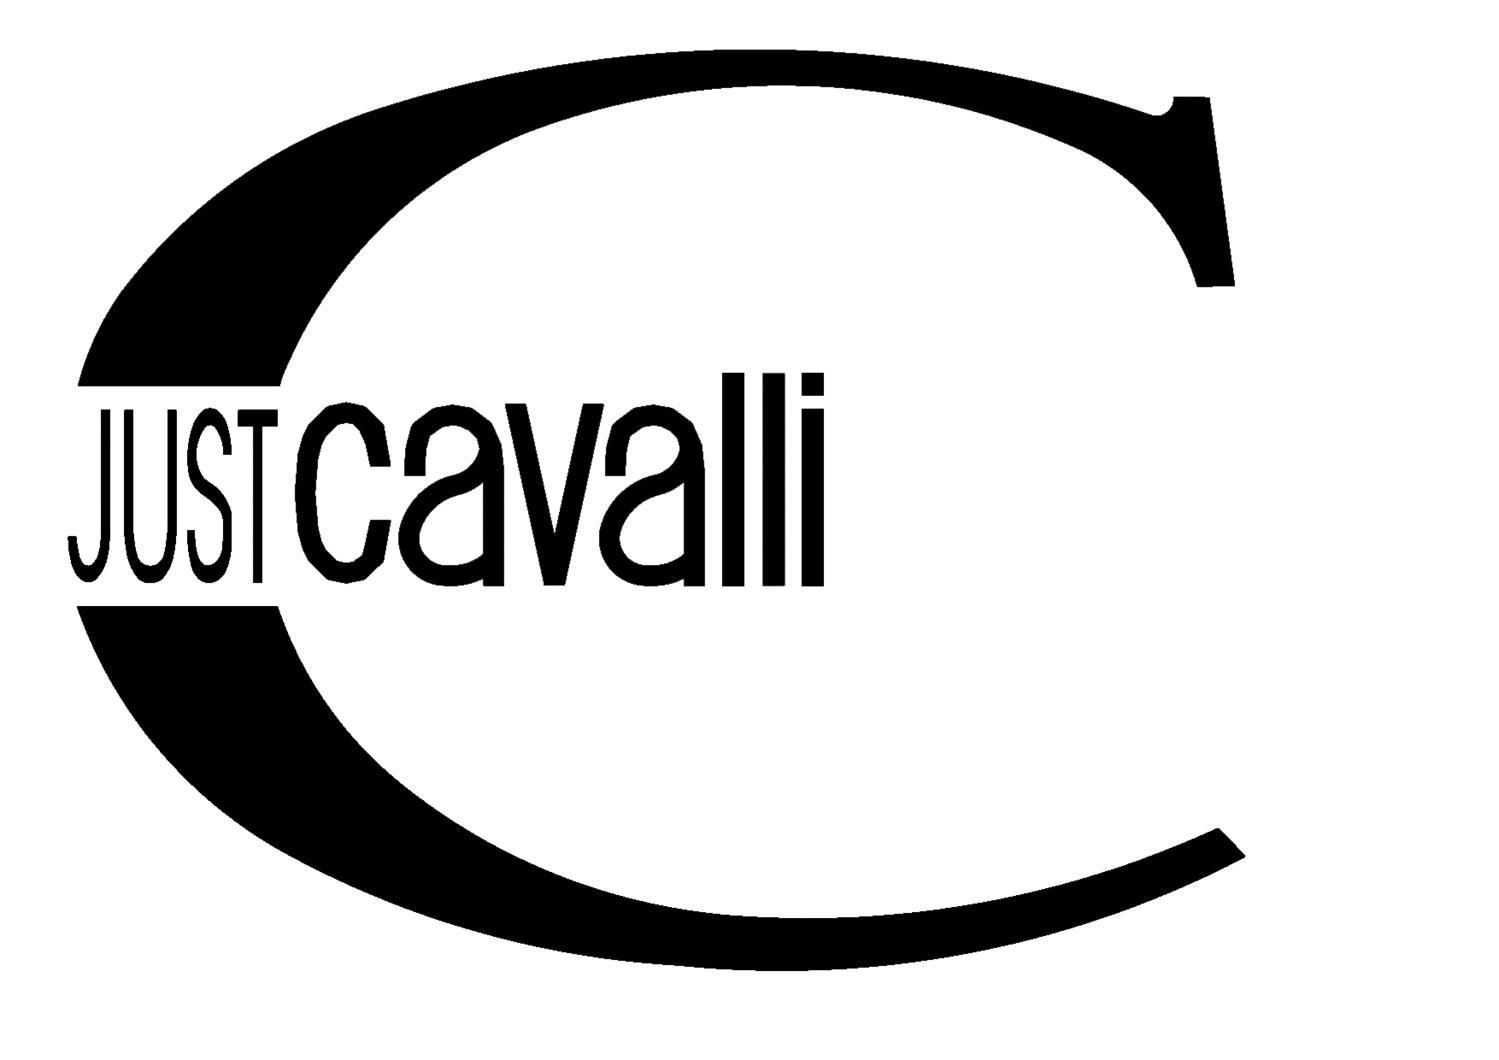 https://tobal.net/wp-content/uploads/2004/08/logo-cavalli-copia.jpg